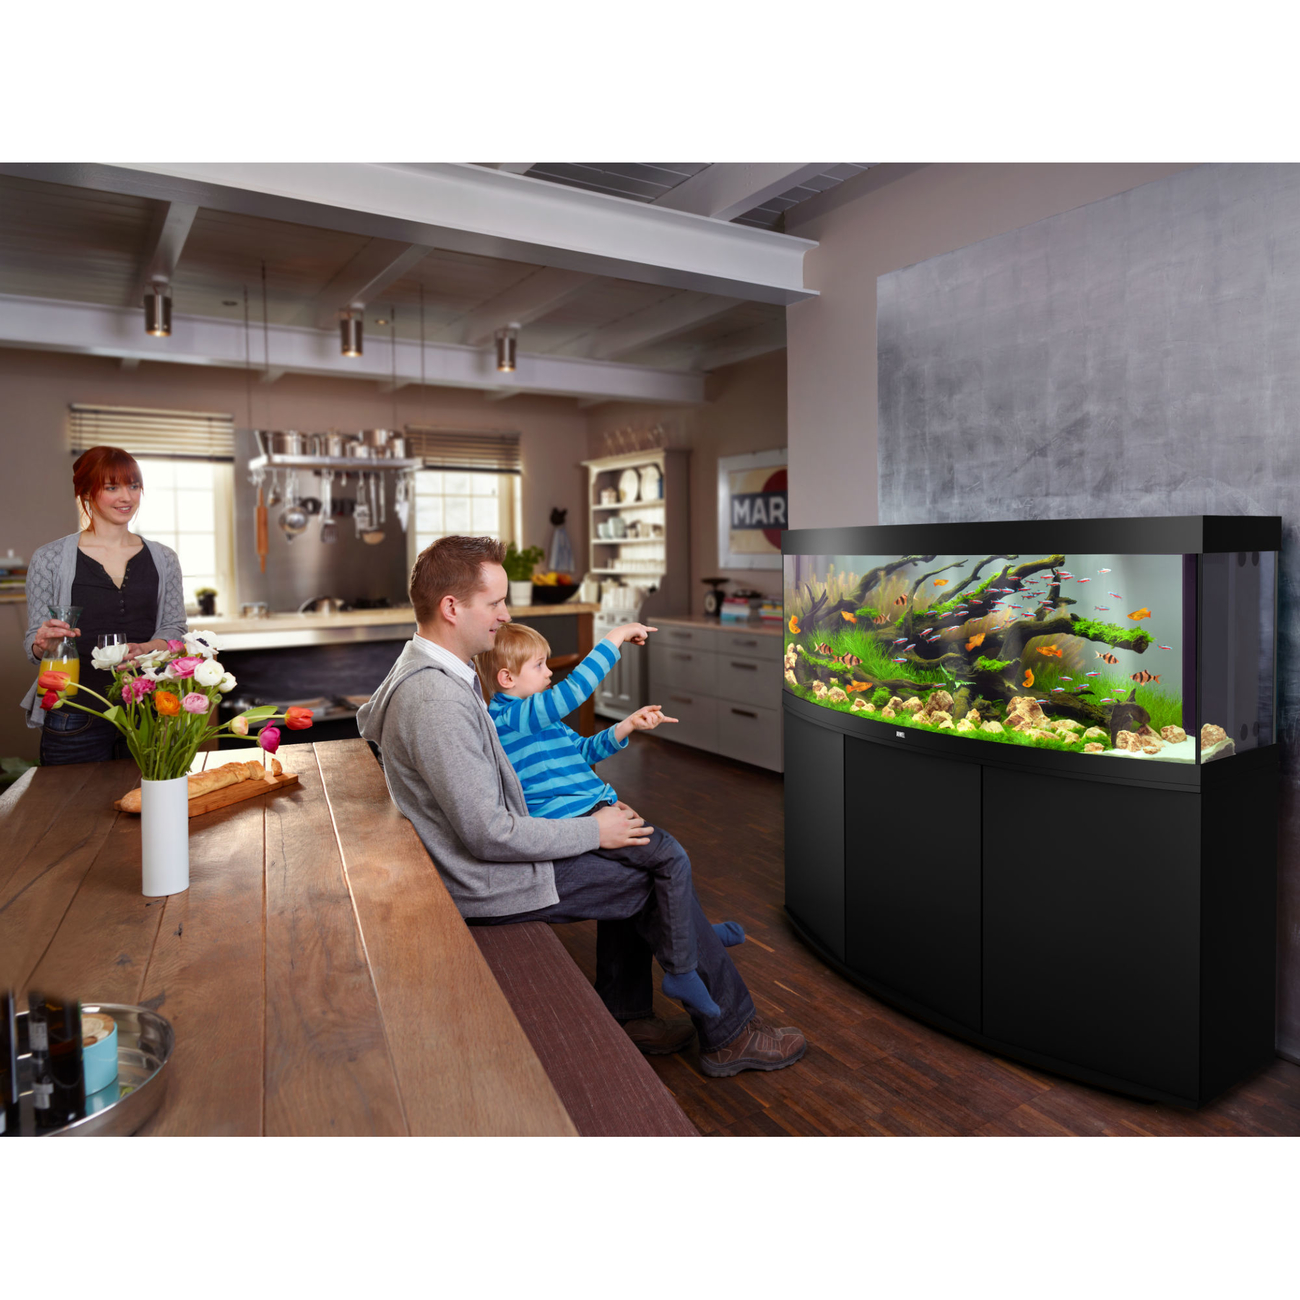 Juwel Vision 450 LED Aquarium mit Unterschrank, Bild 4